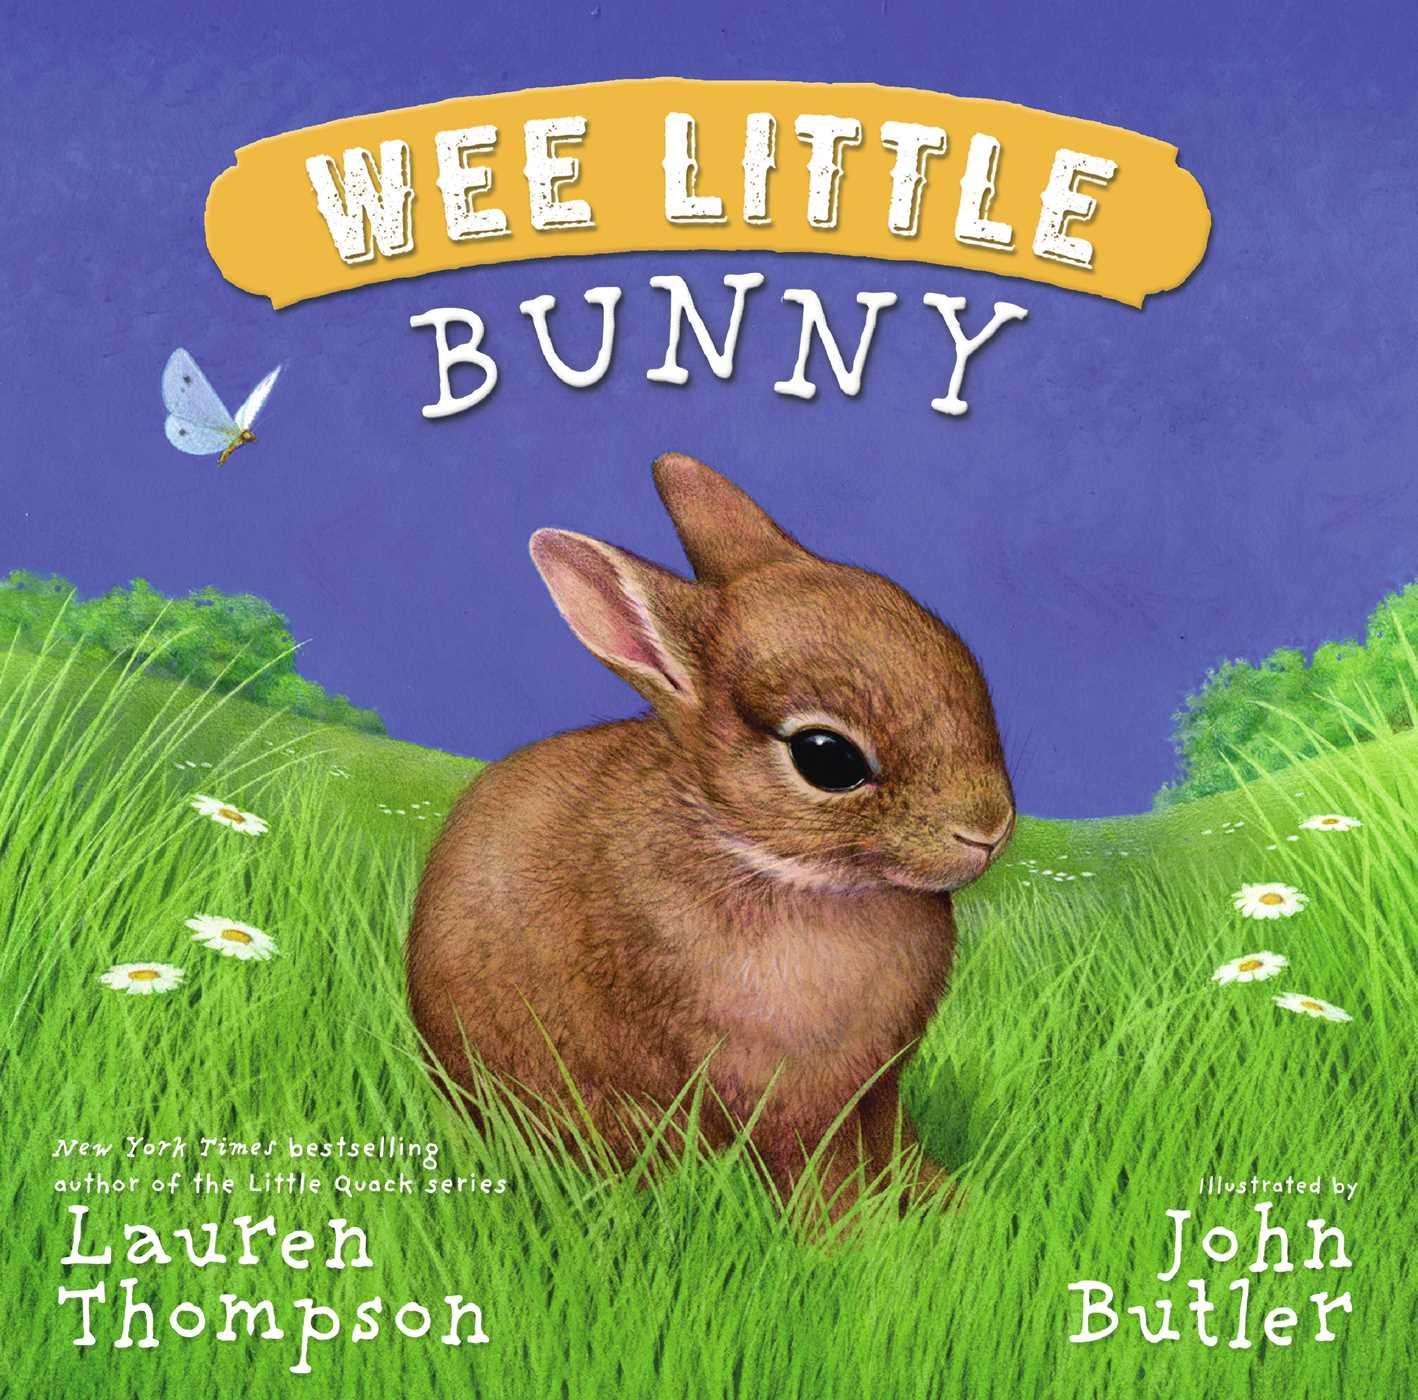 Wee little bunny 9781416982845 hr